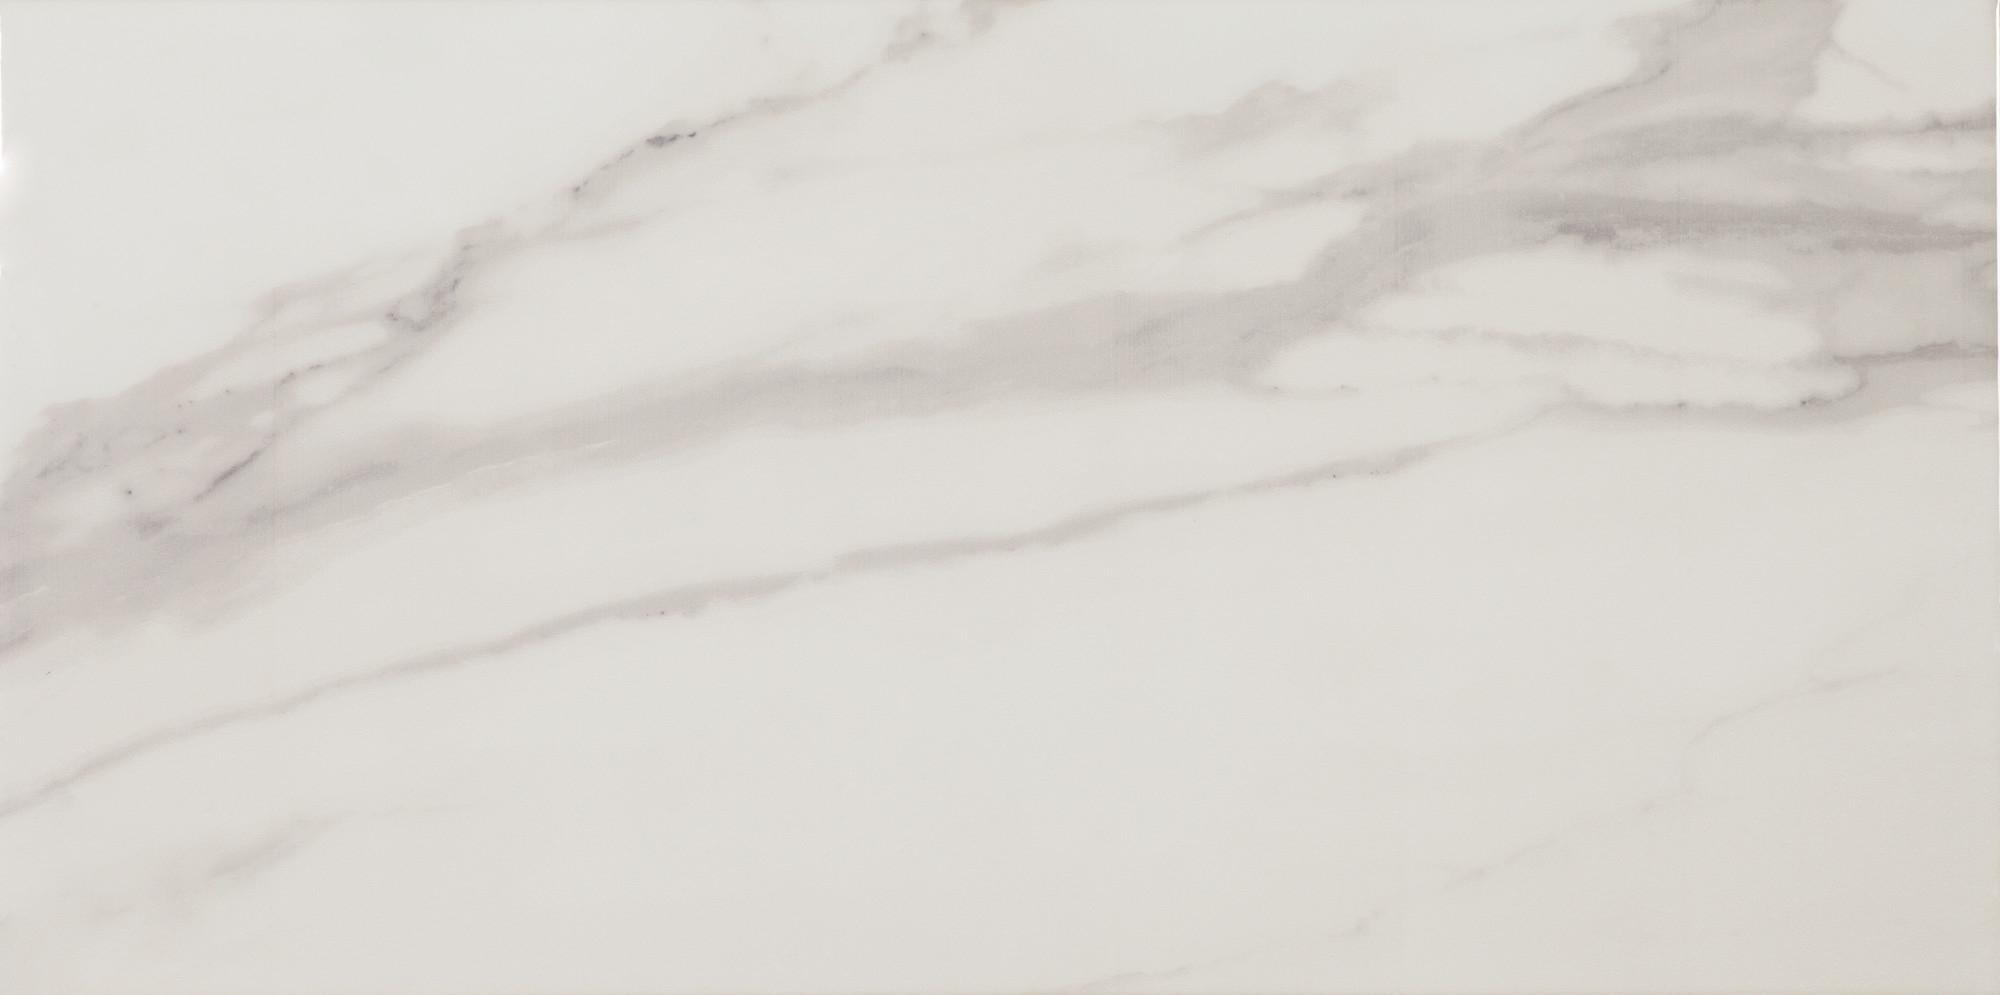 płytki marmurek ścienne Azur